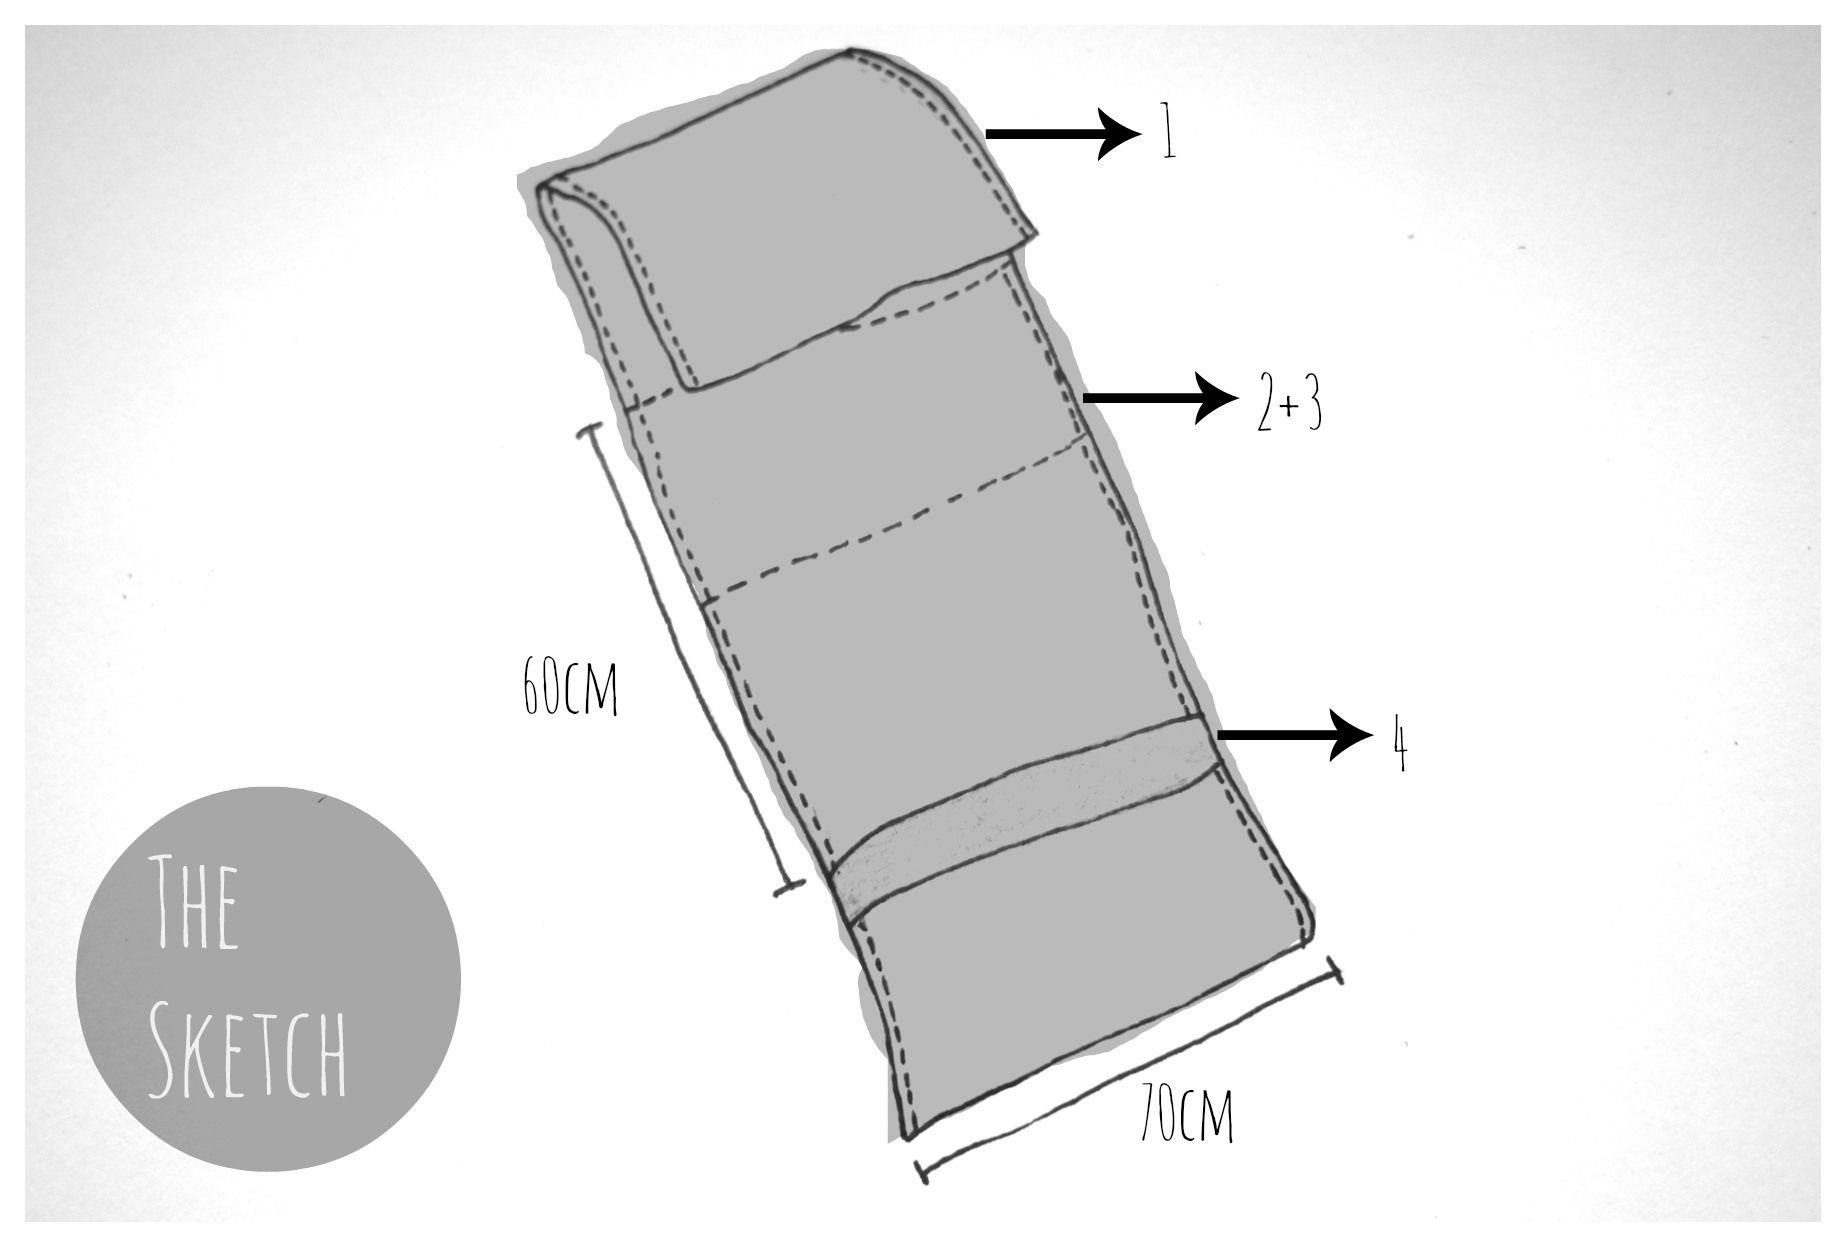 Make Diy Ikea Pello Poang Chair Felt Cover Ikea Chair Cover